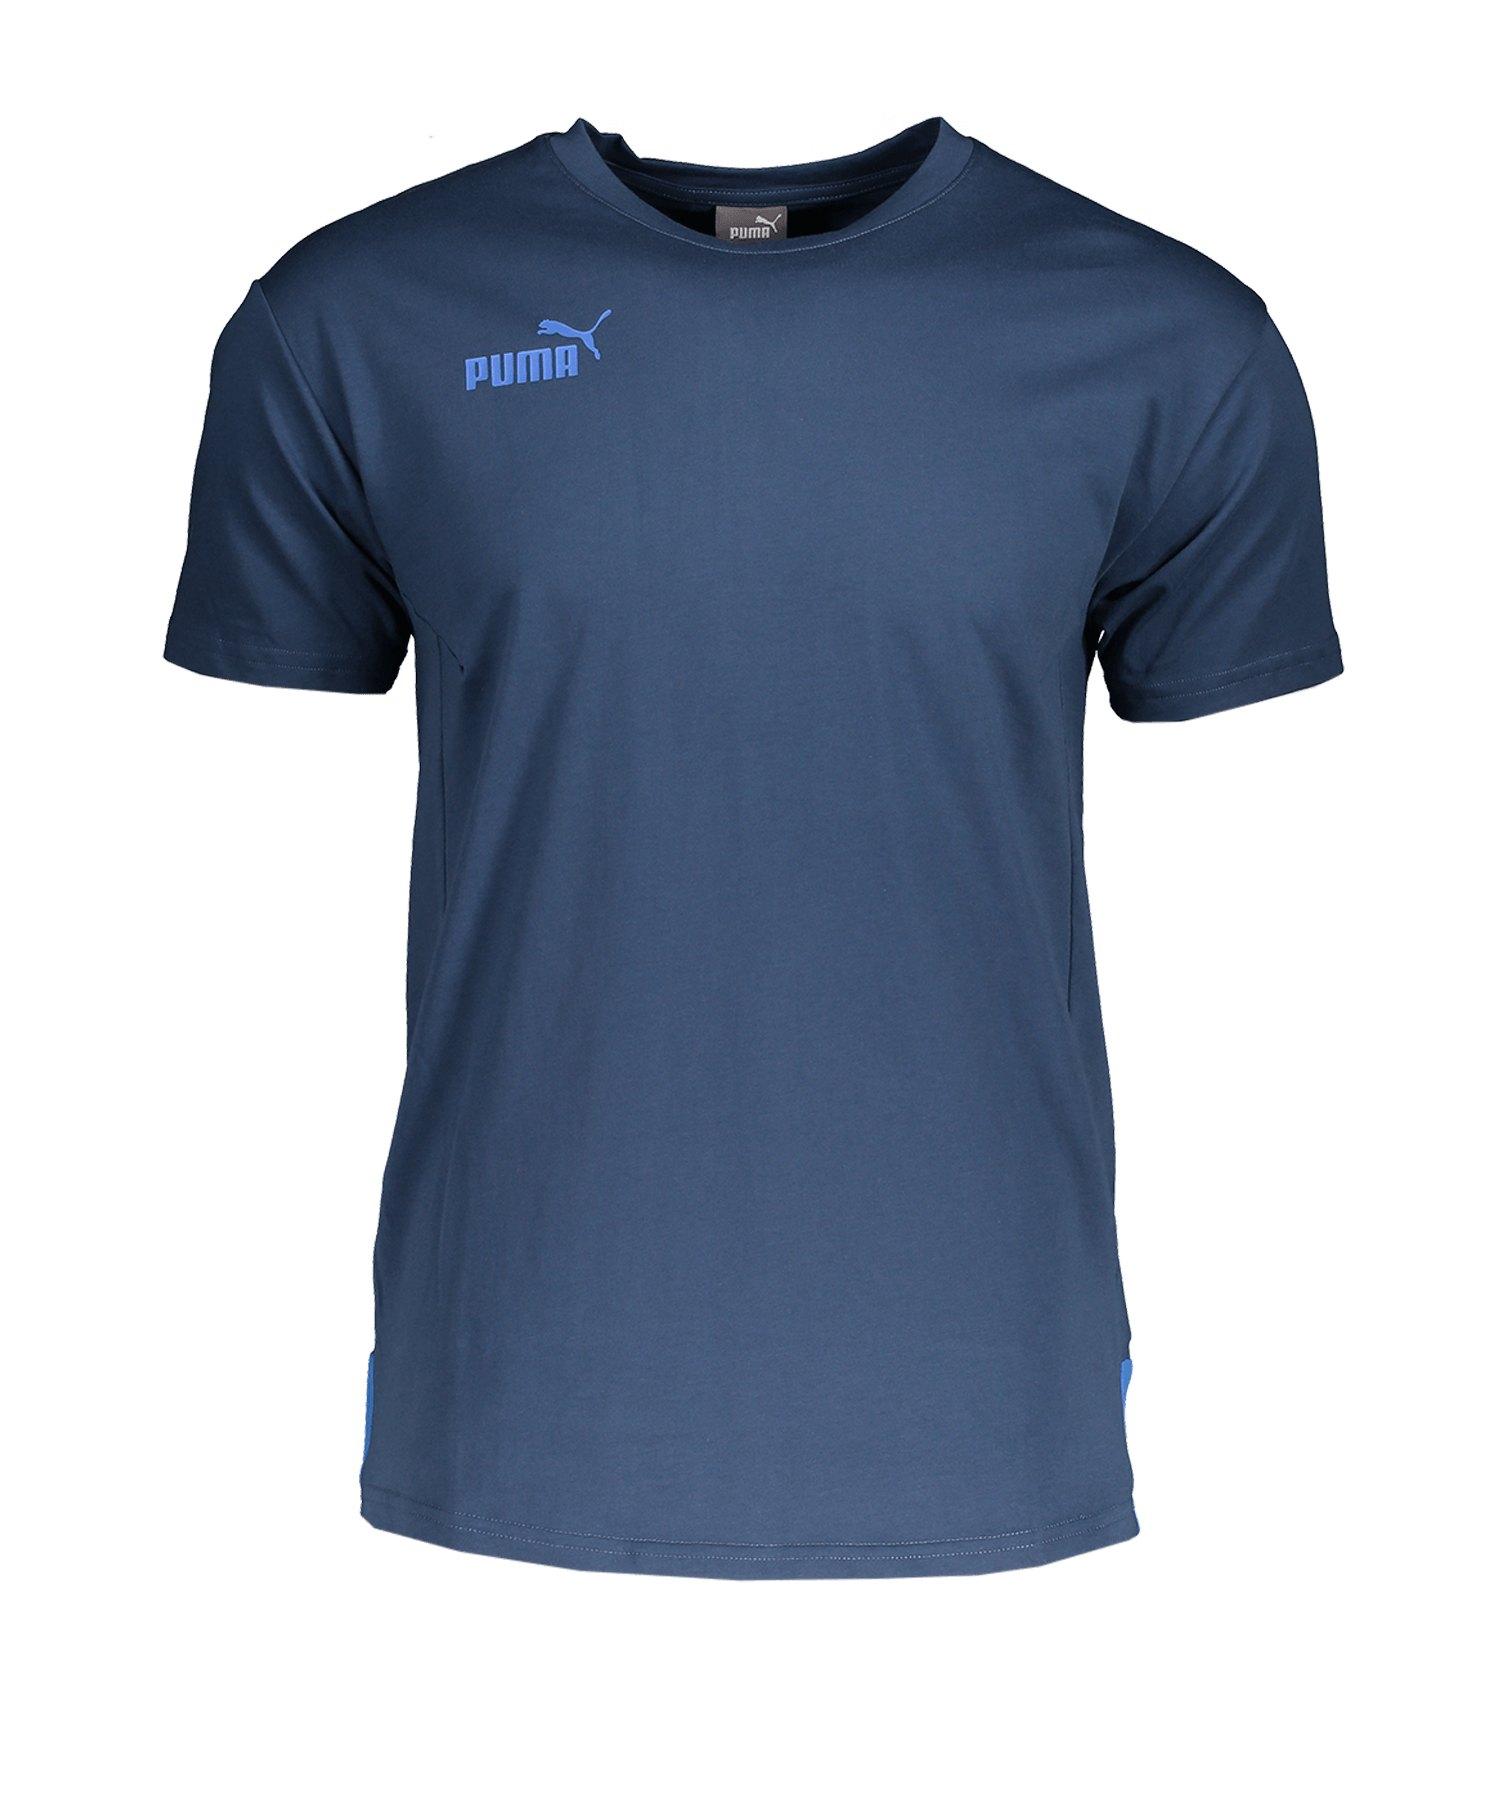 PUMA PUMA ftblNXT Casuals T-Shirt Blau F04 - blau